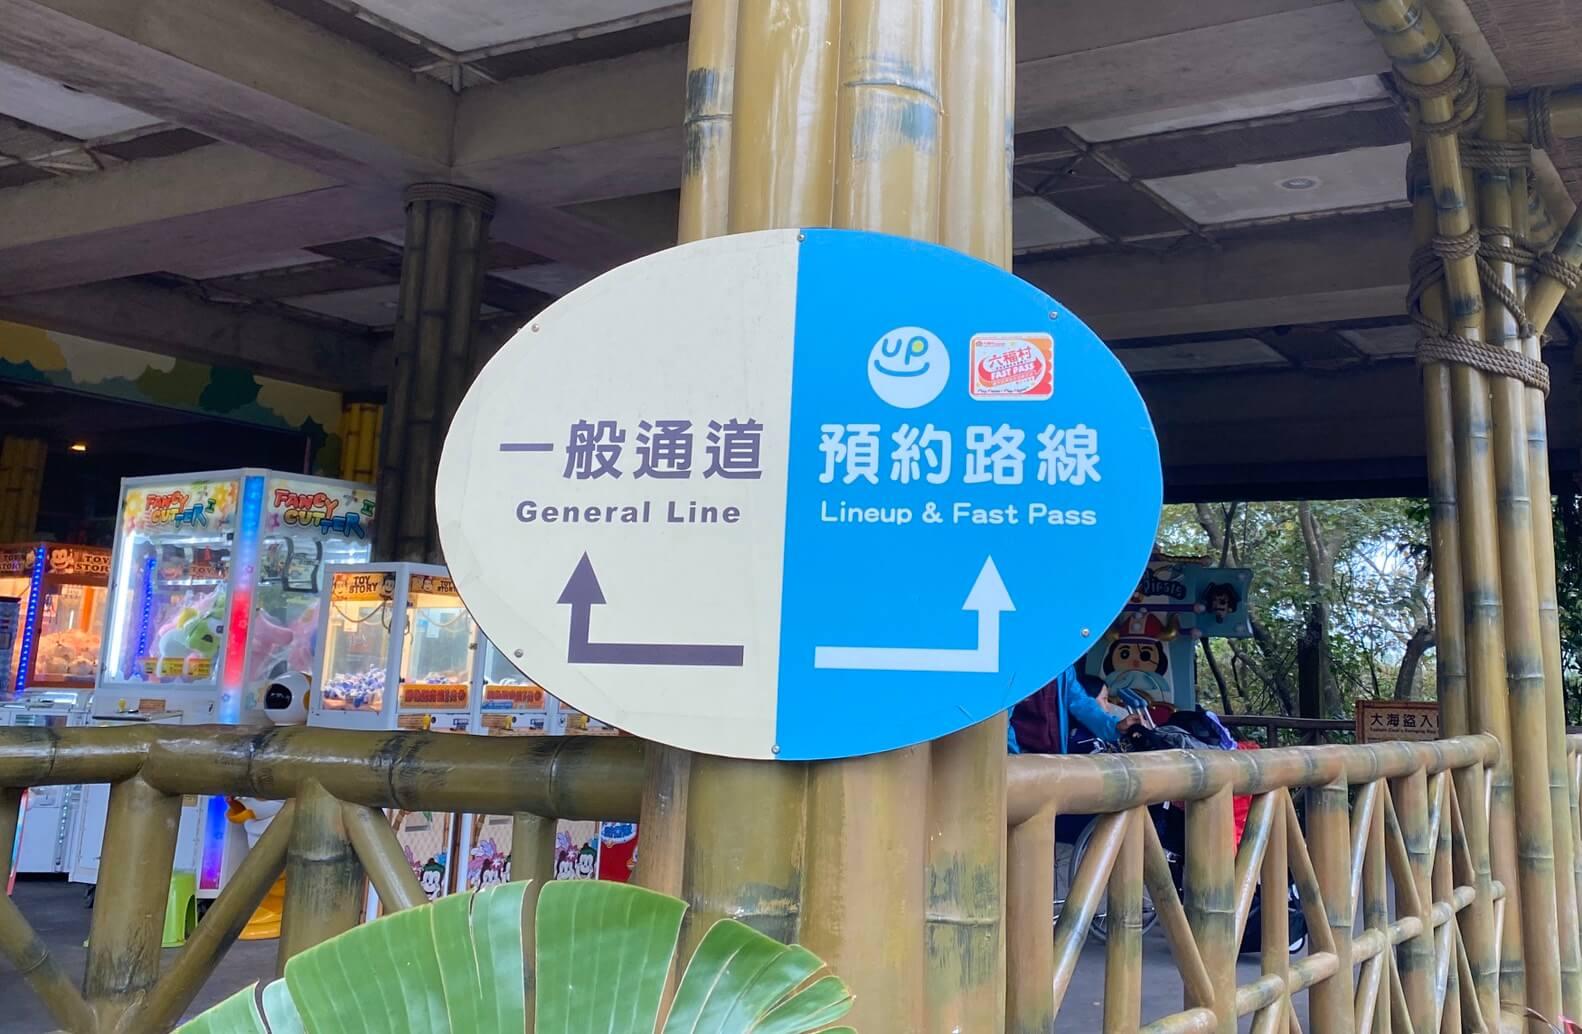 Lineup 六福村快速通關 APP 預約路線